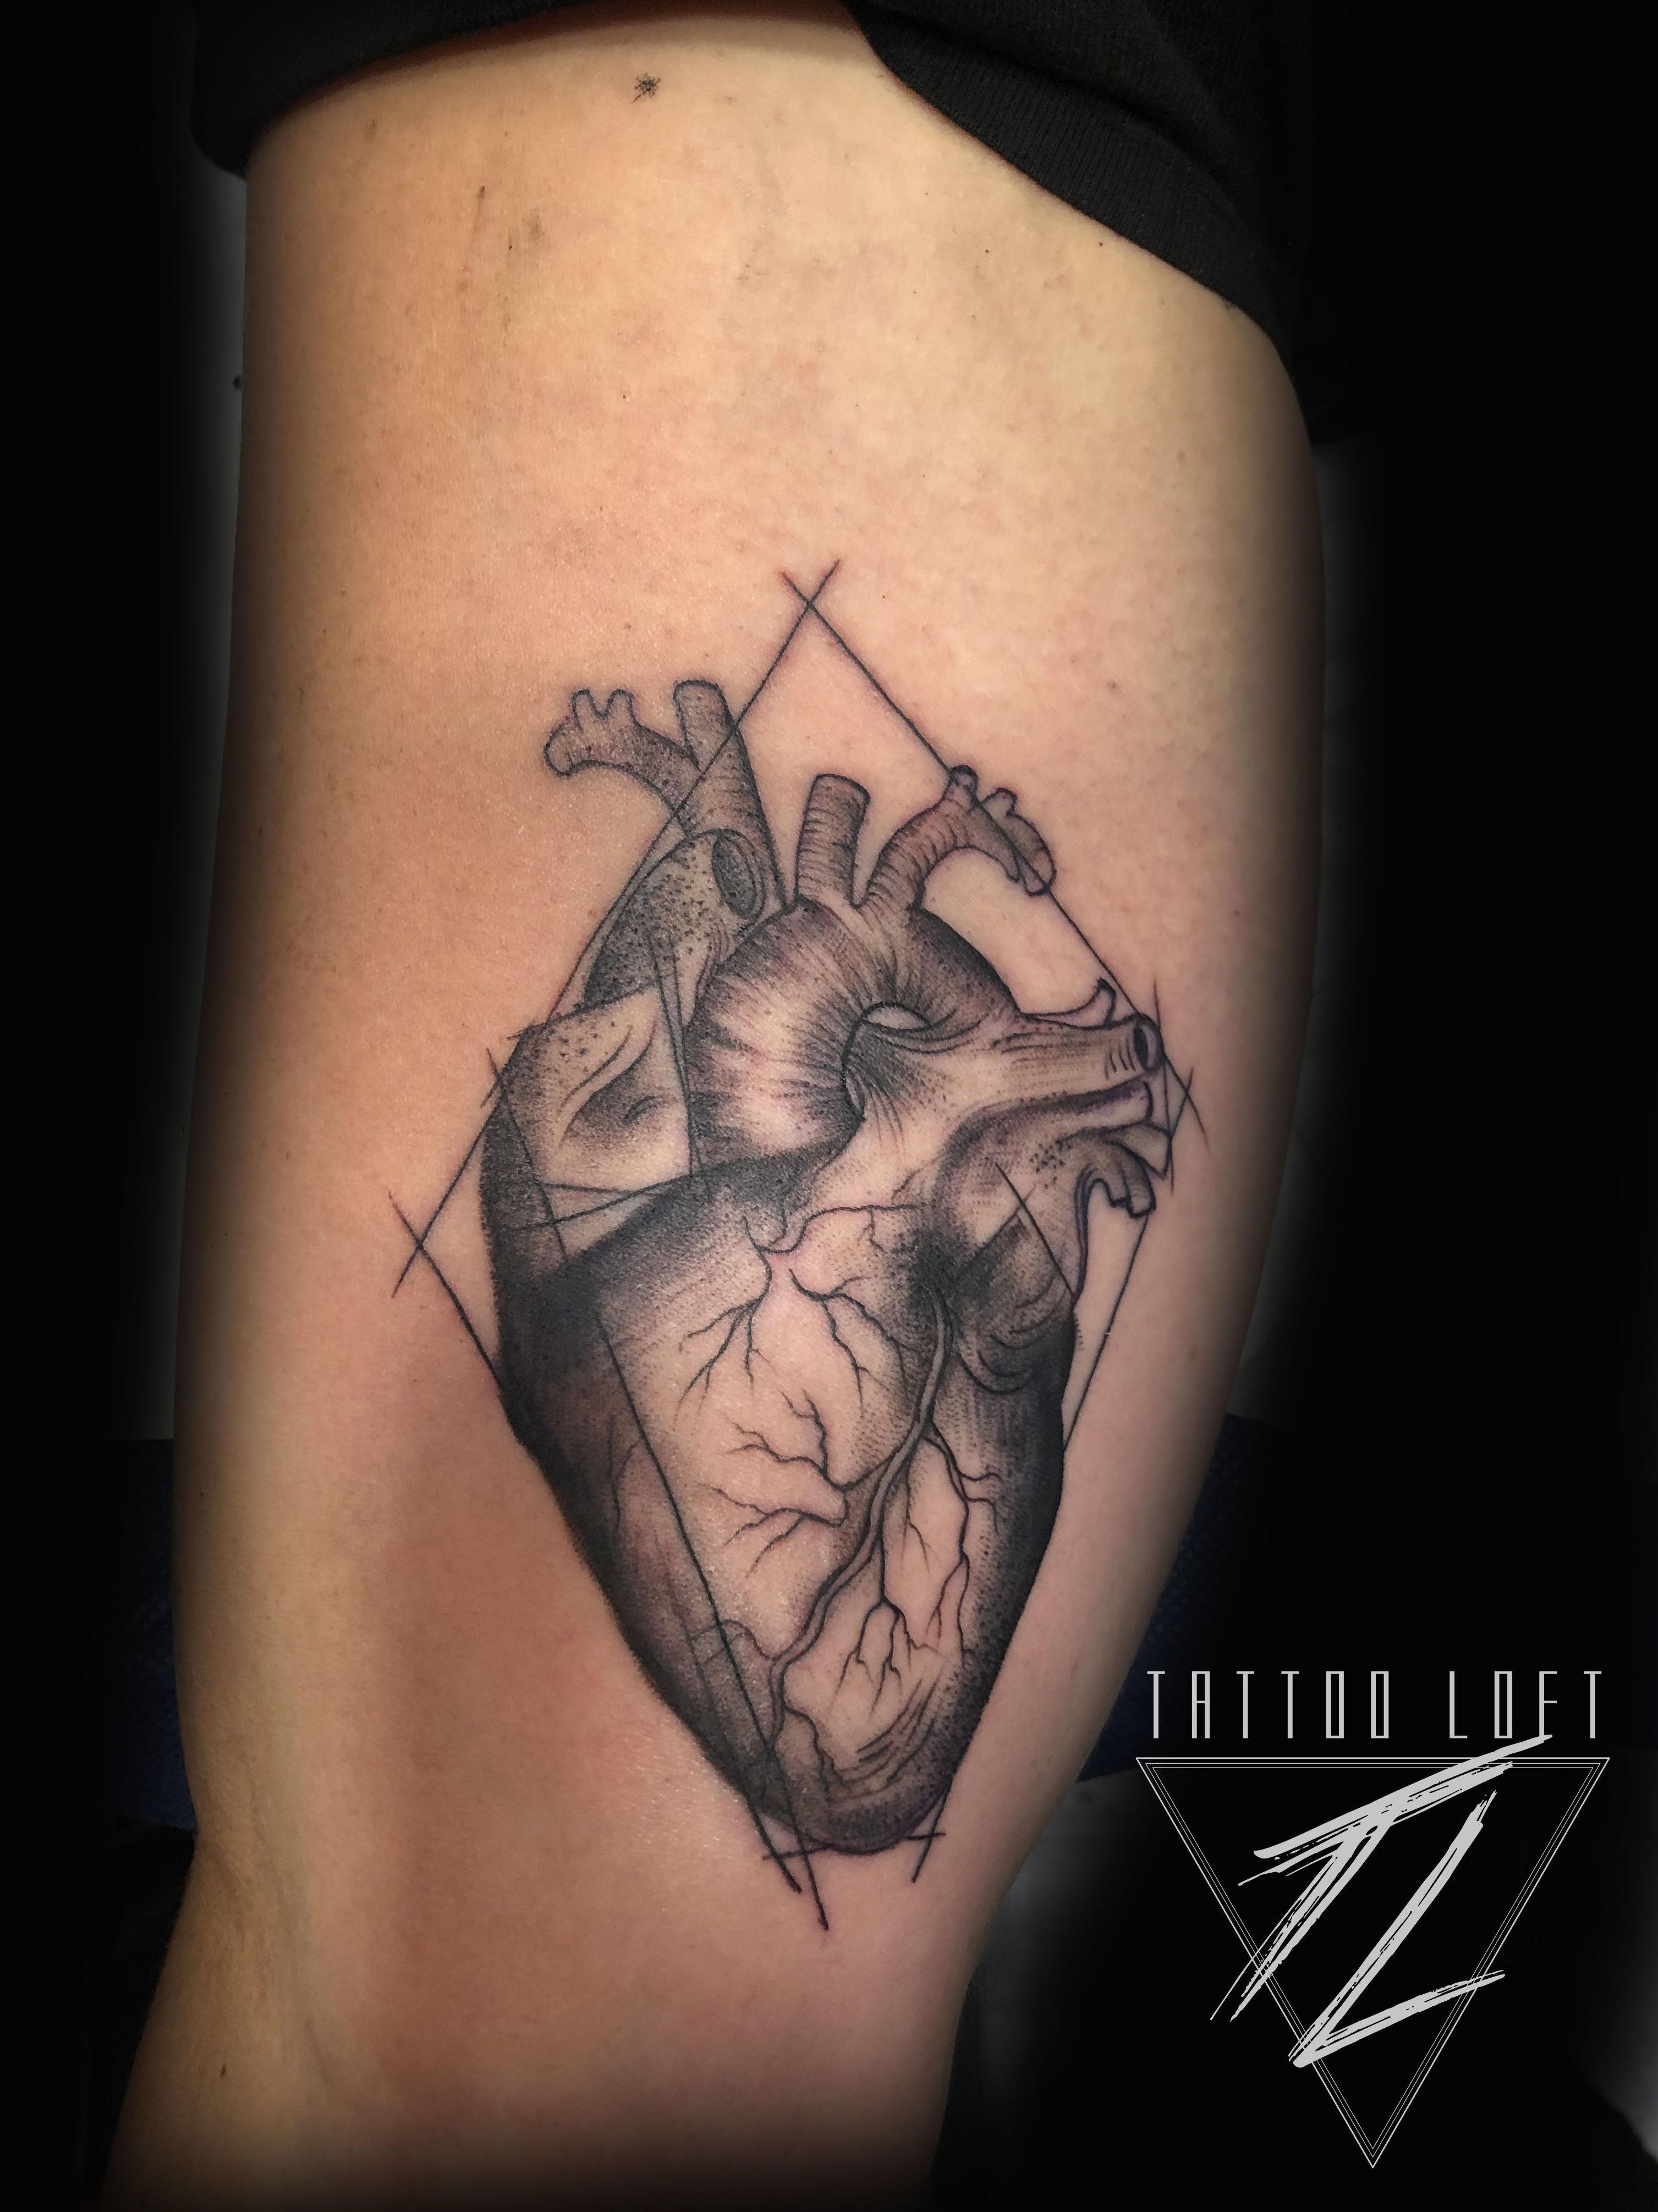 Tatuaje de un corazón Carabanchel